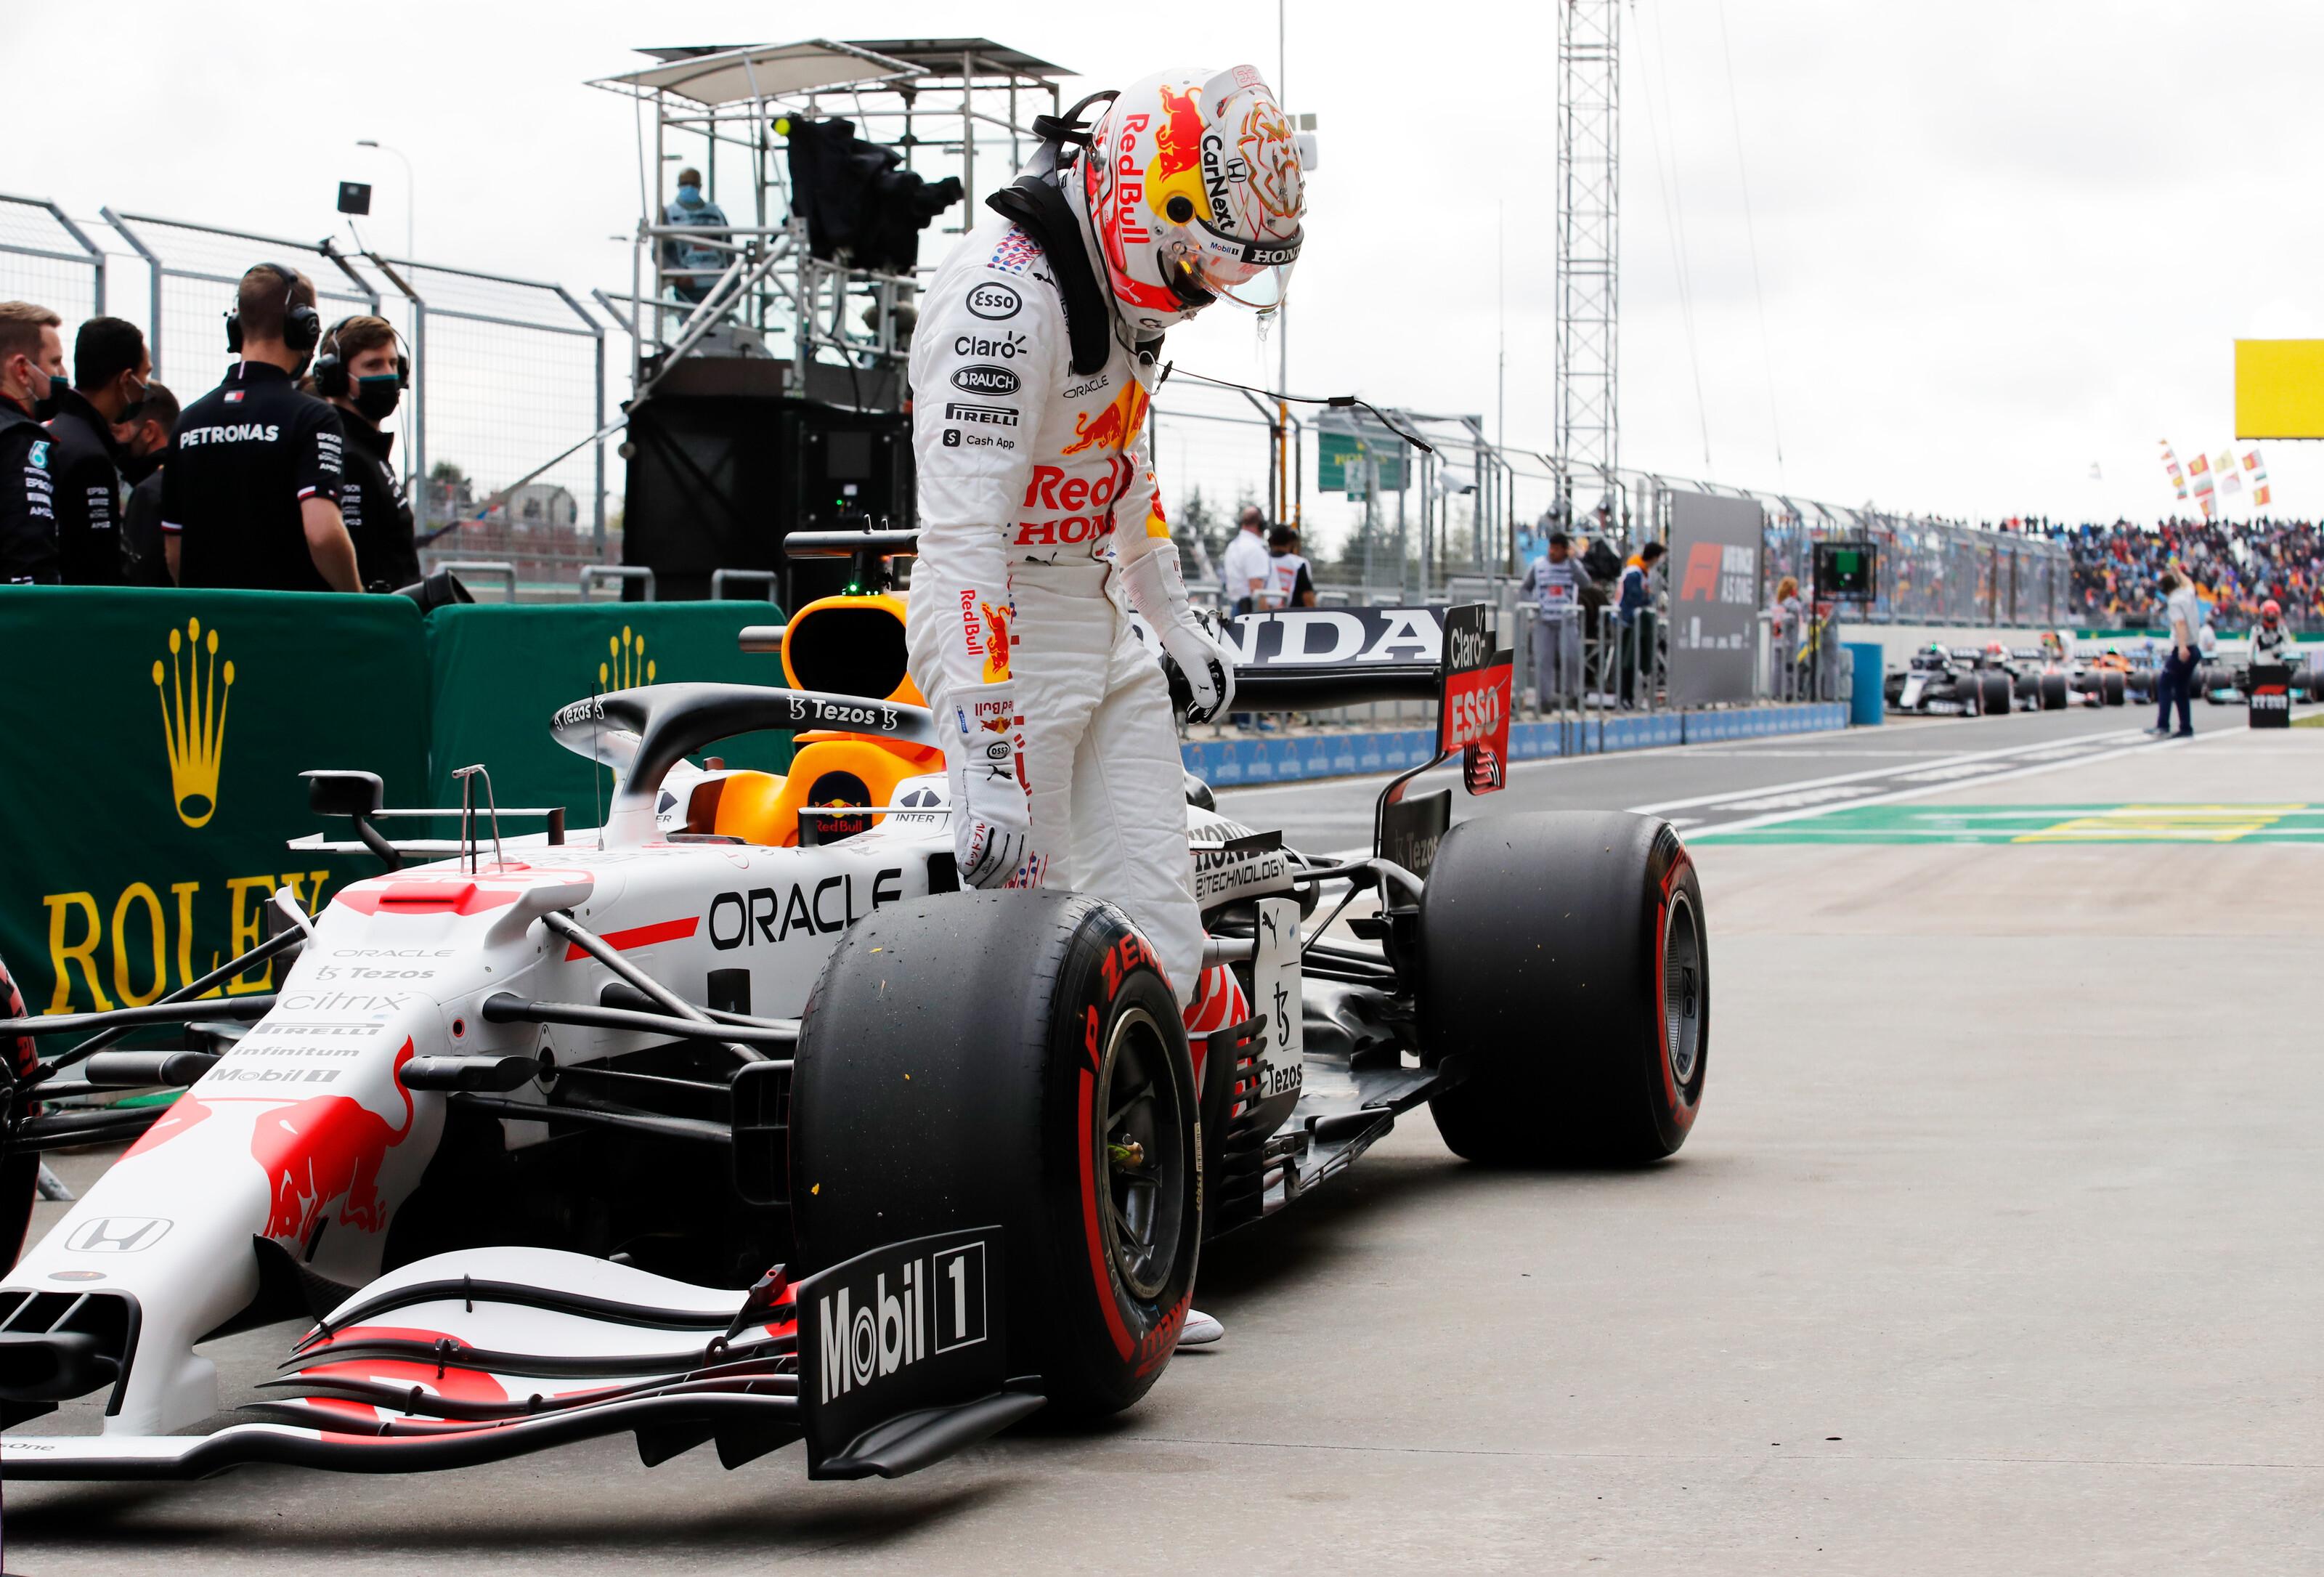 F1 Grand Prix Of Turkey Qualifying